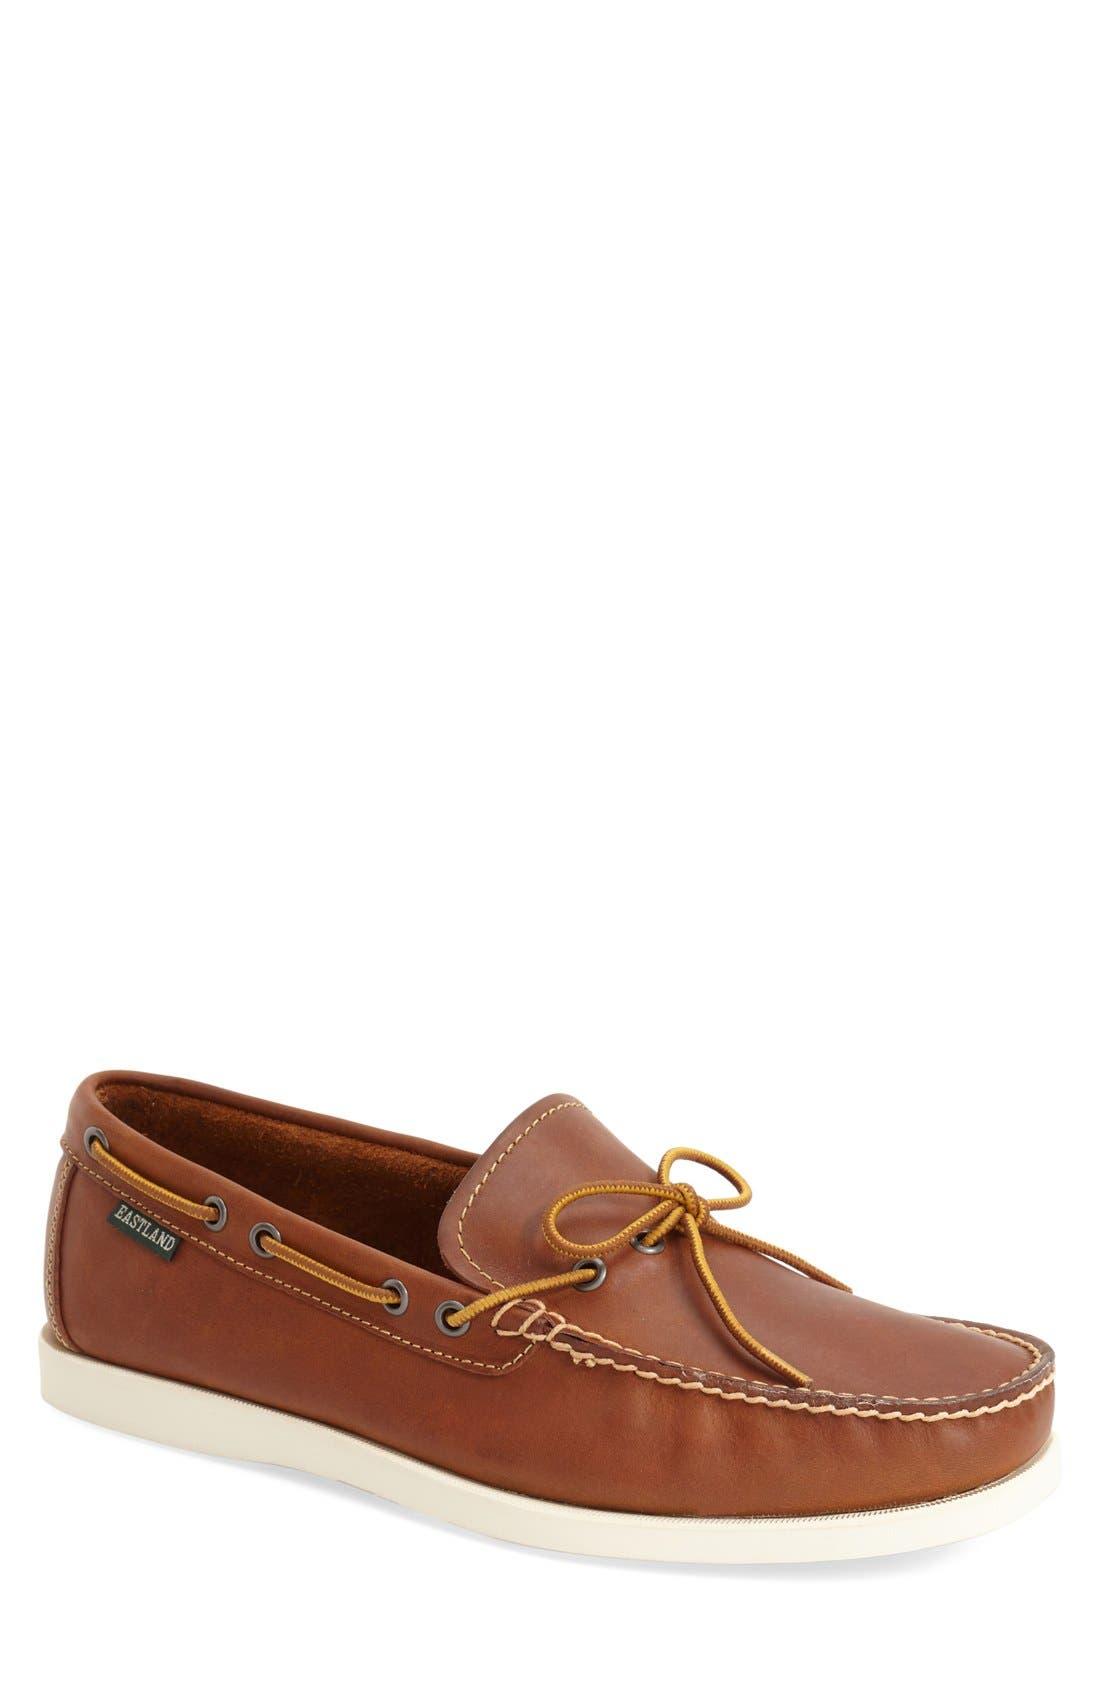 Eastland 'Yarmouth' Boat Shoe